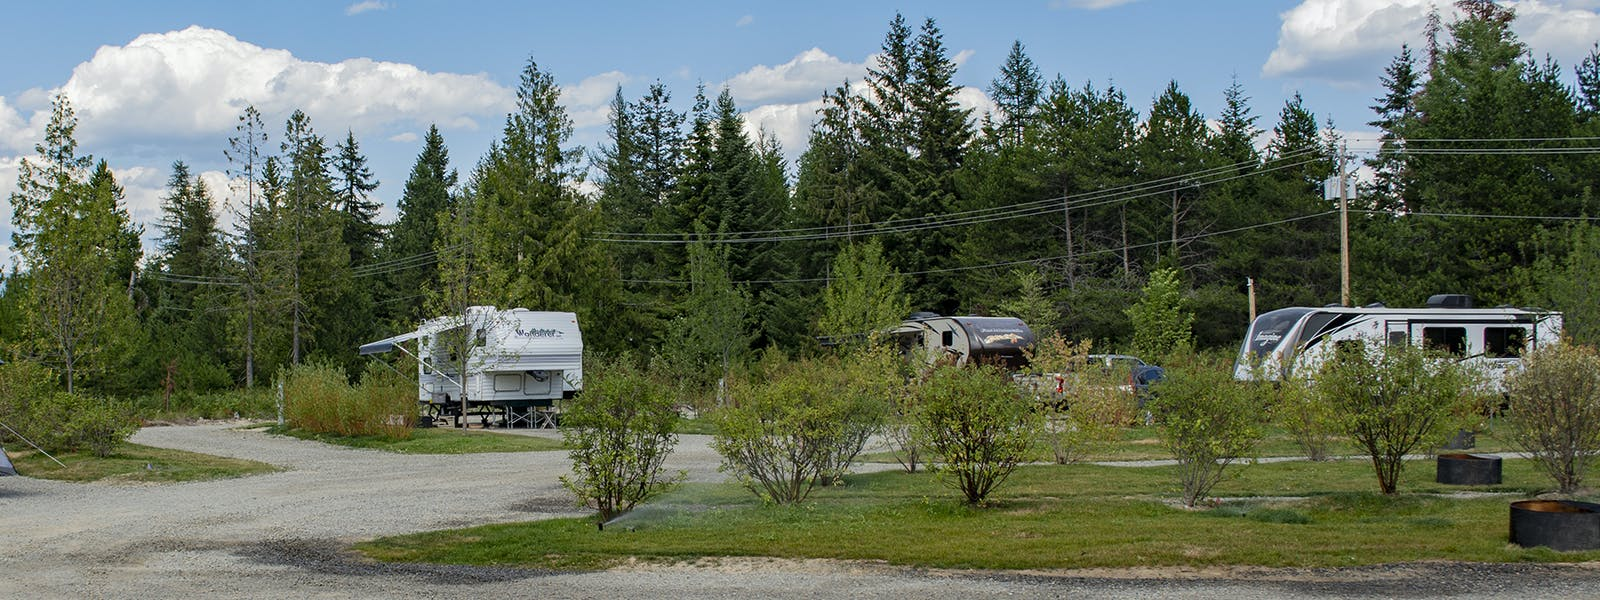 Bonners Ferry Log Inn   Log Inn Cabins and RV